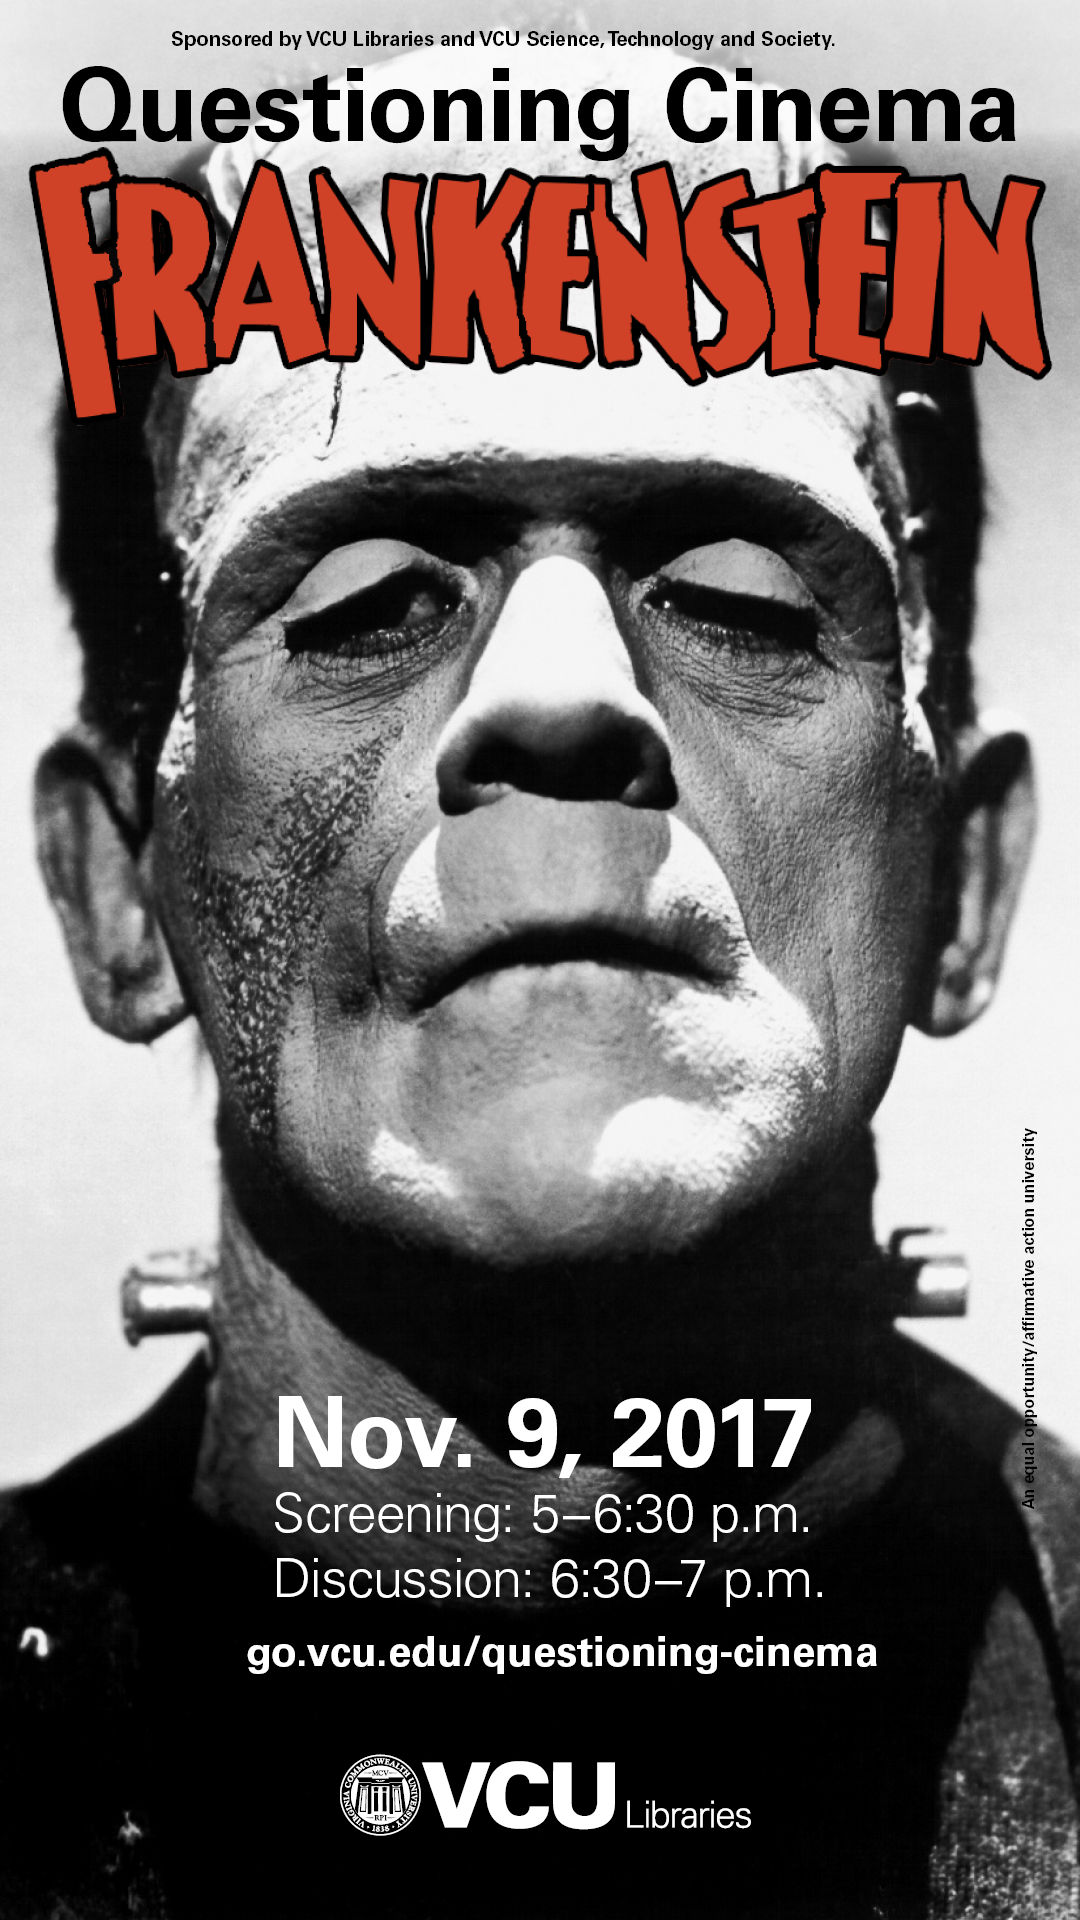 Questioning Cinema Frankensteinv05.png